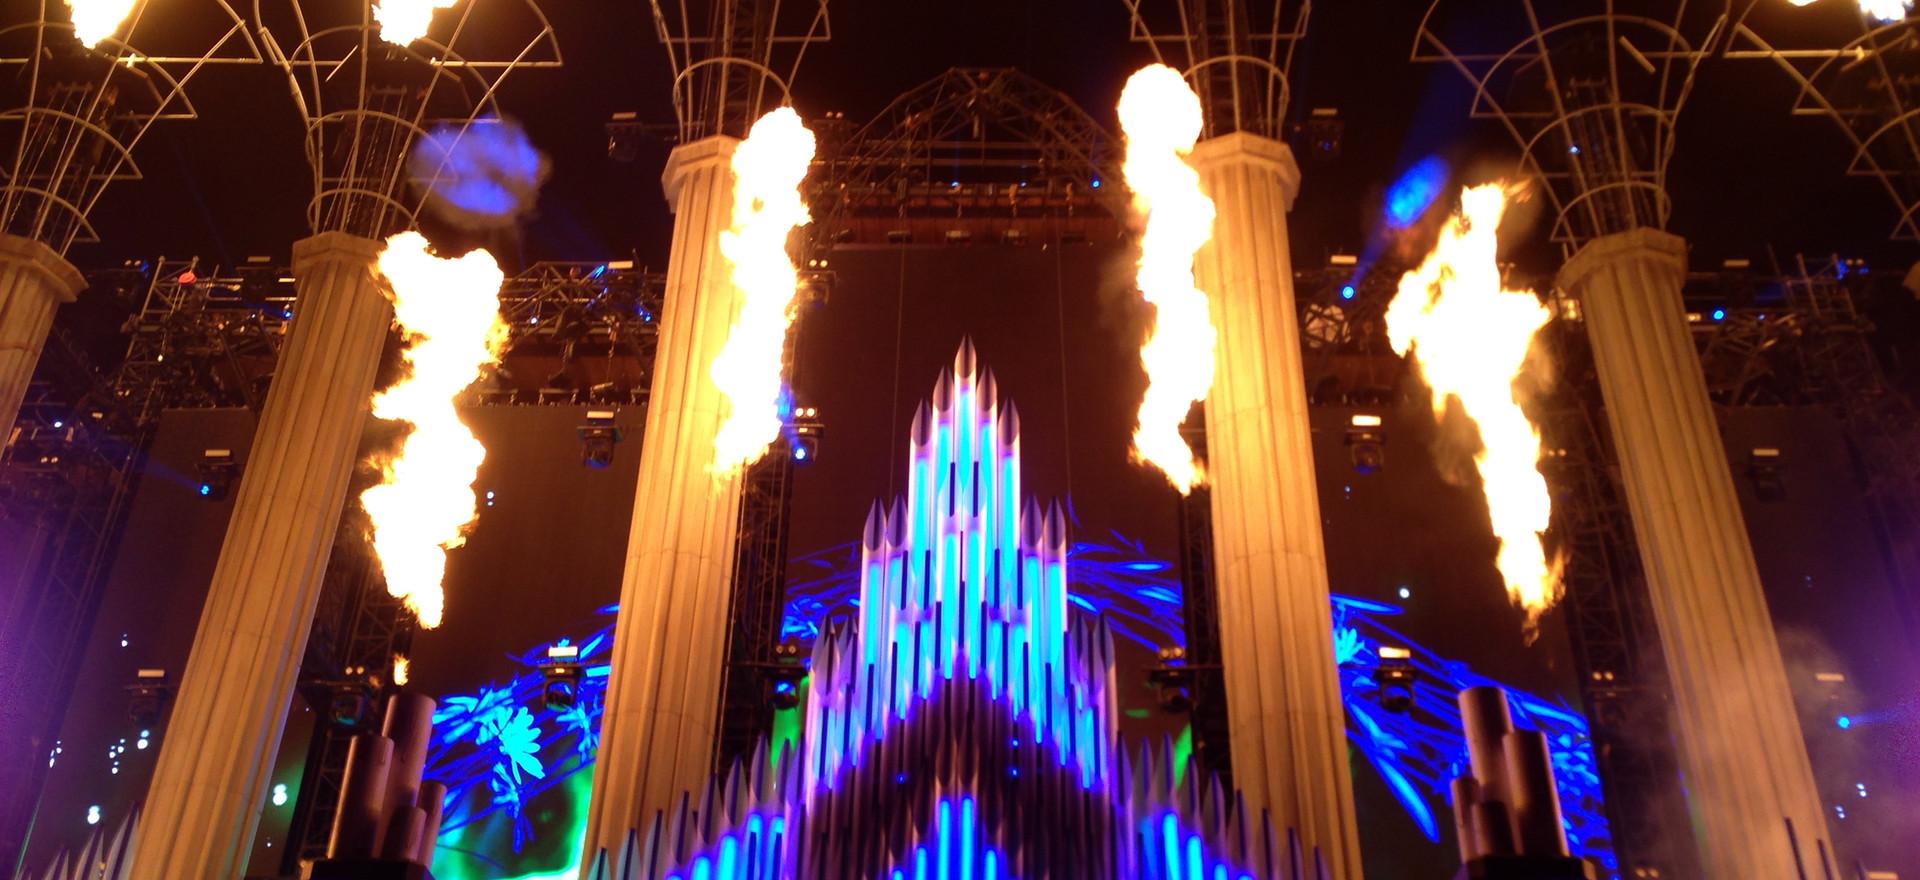 Electric Daisy Carnival Las Vegas 2014?